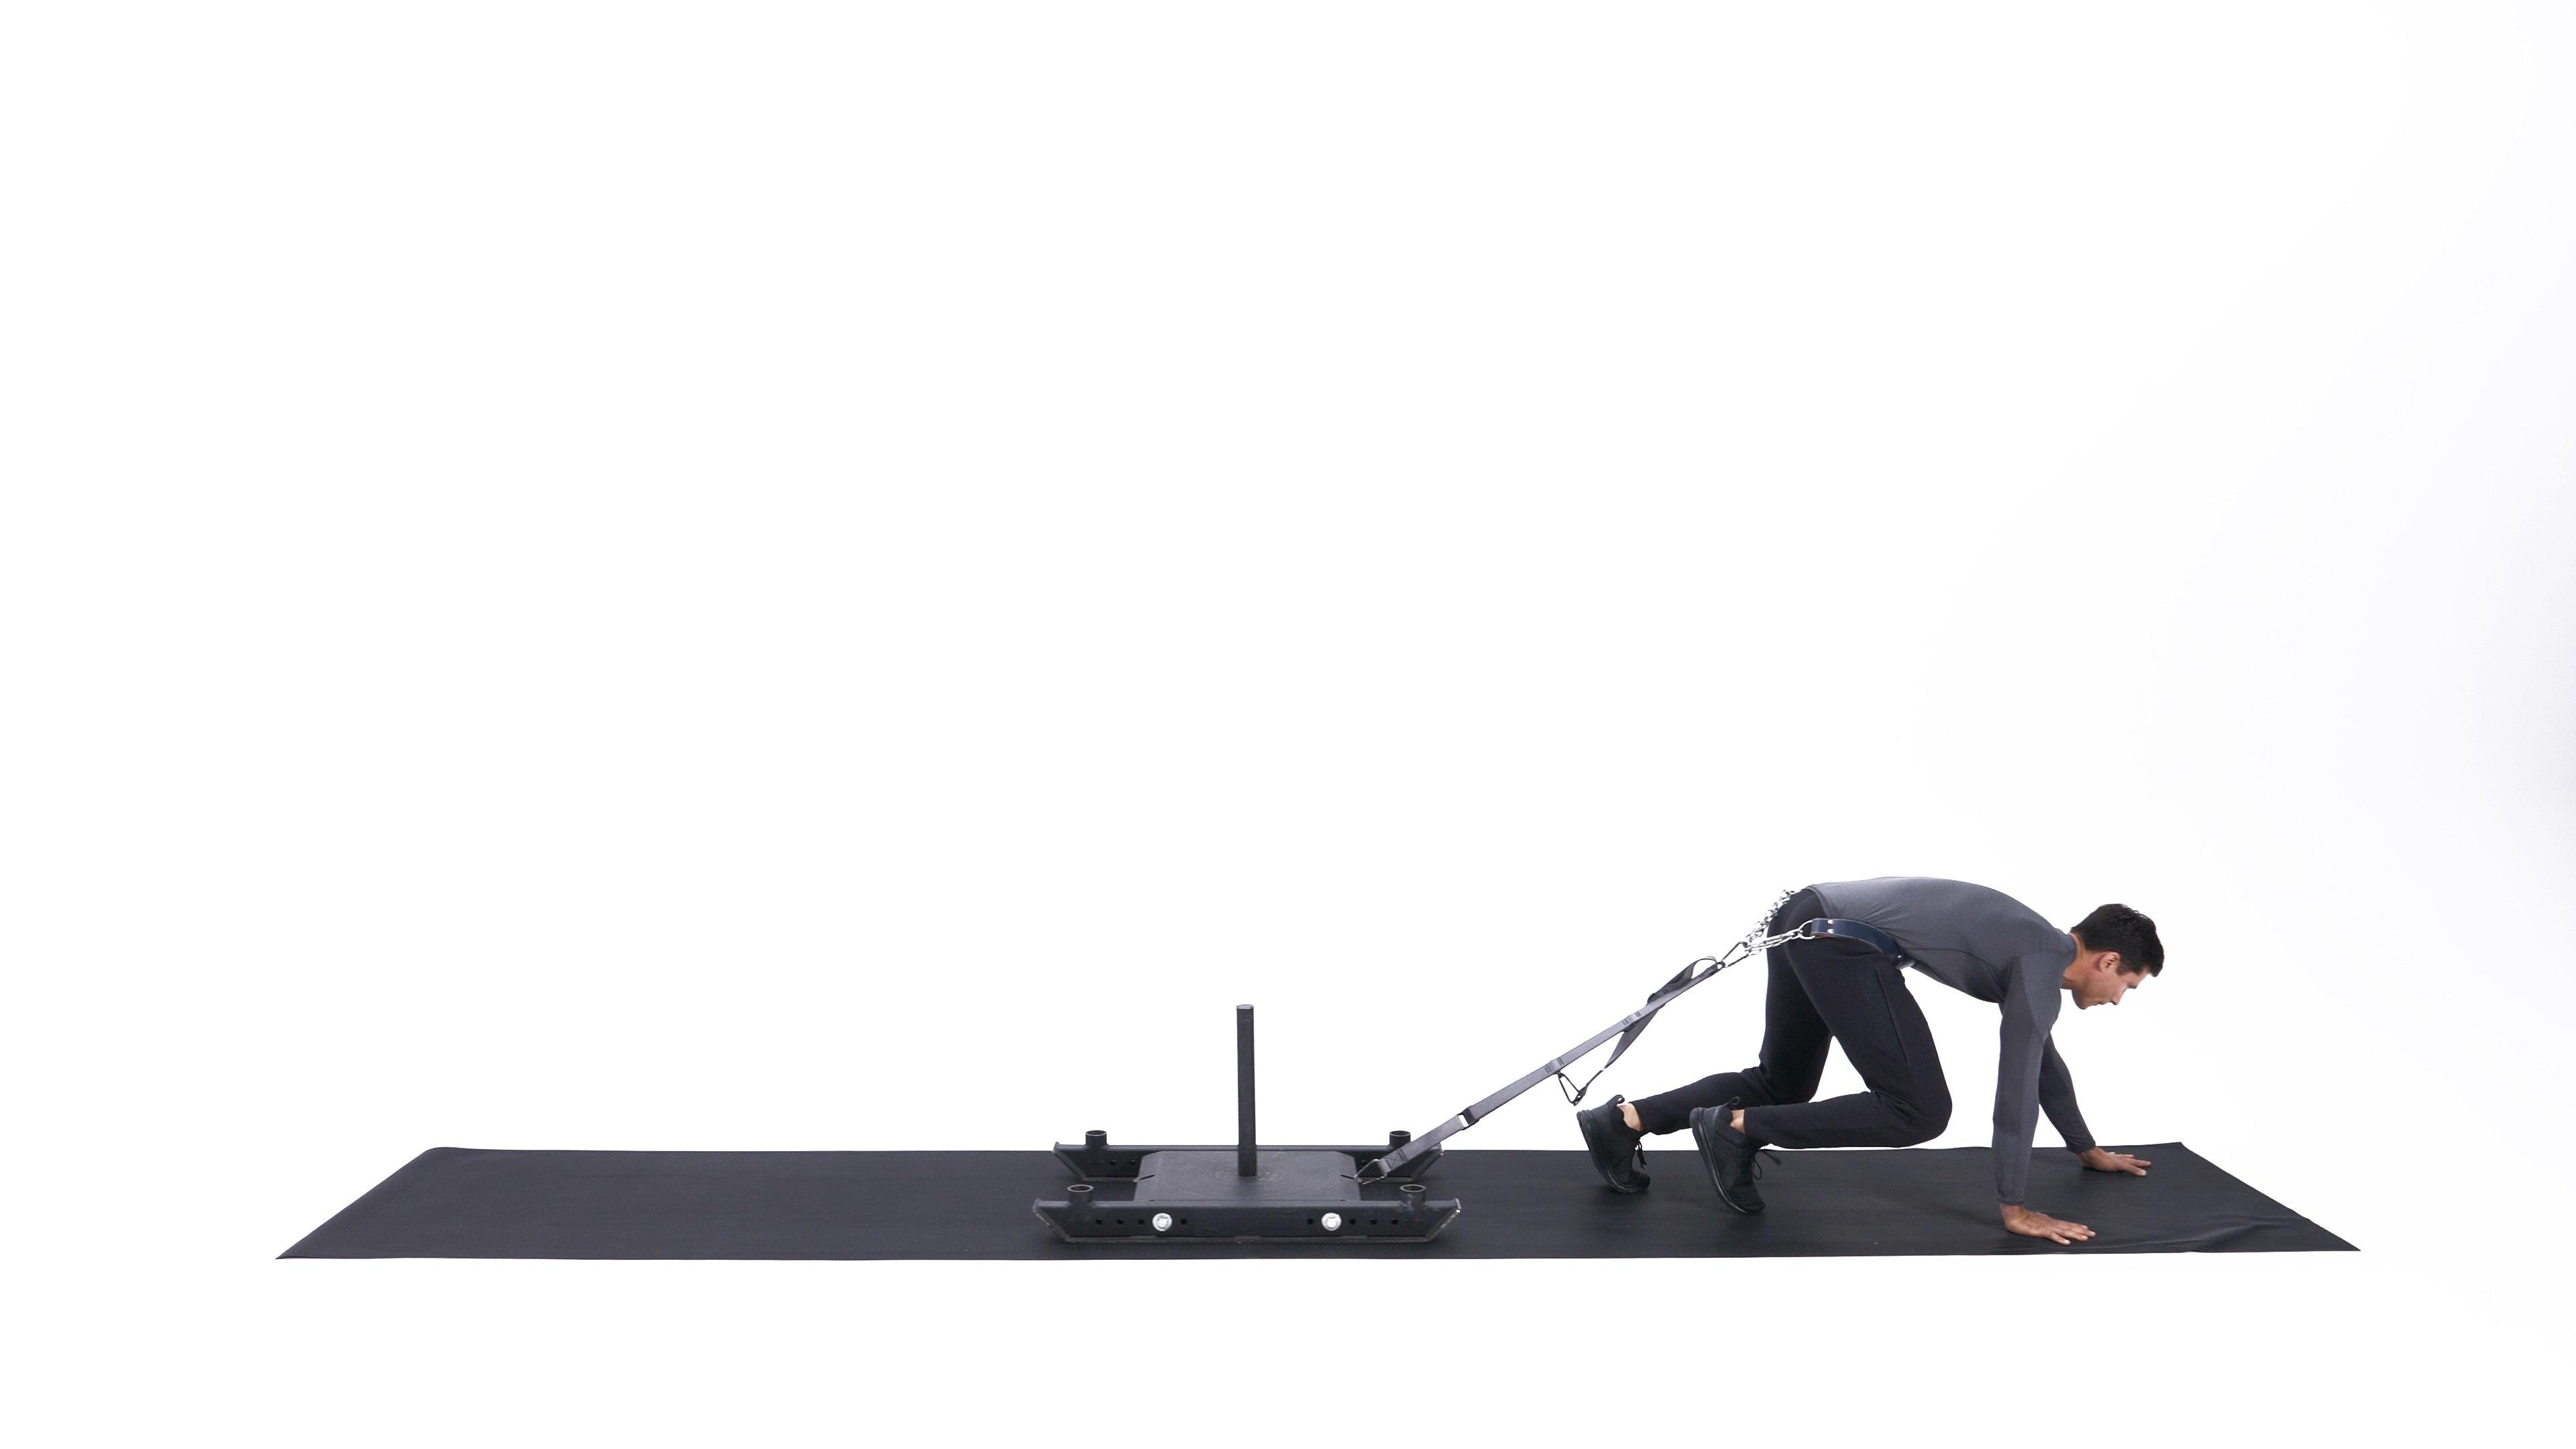 Bear crawl sled drag image